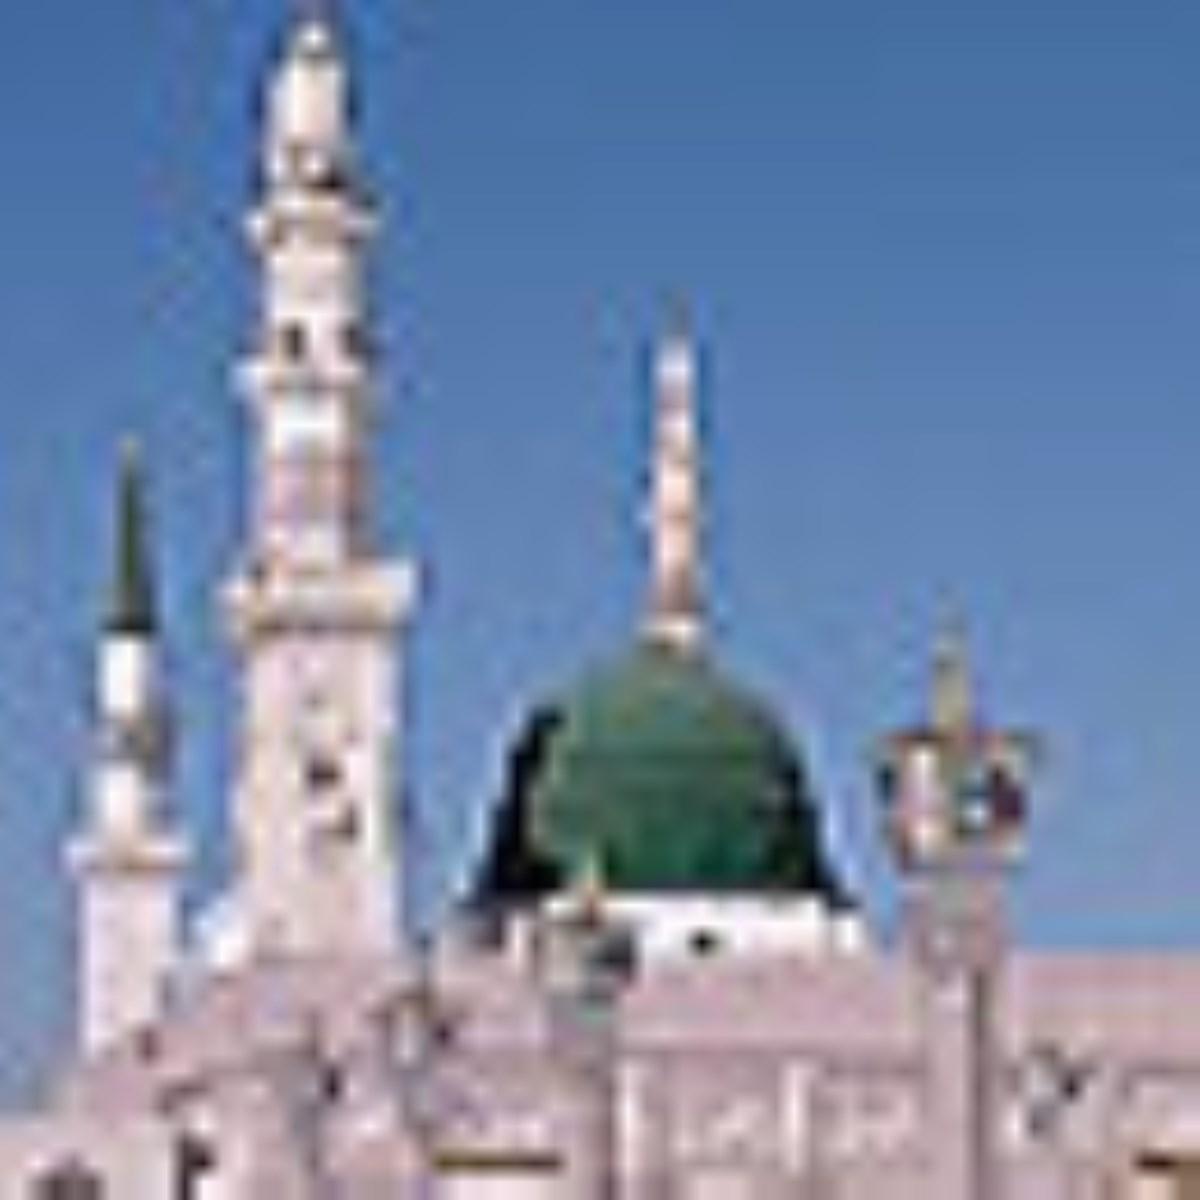 اکرام نبى اکرم(صلی الله علیه و آله و سلم)